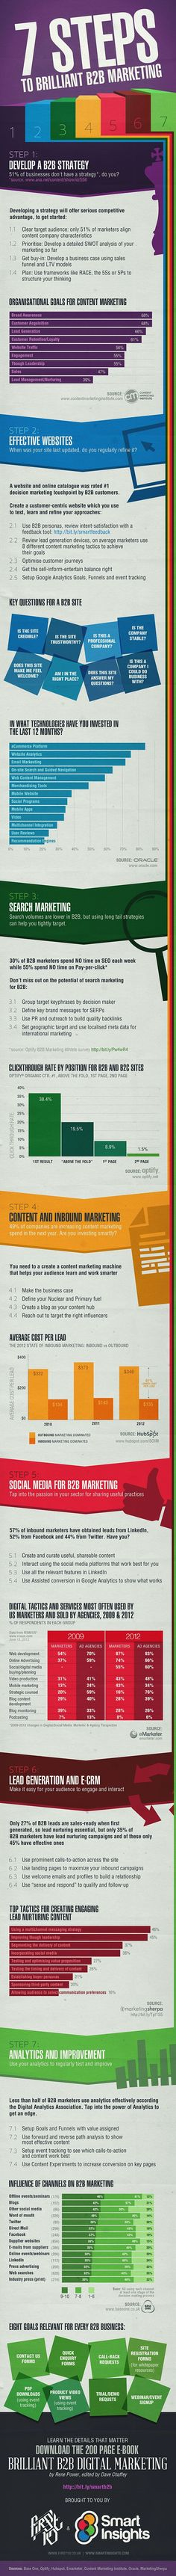 7 Steps to Brilliant B2B Digital-Marketing